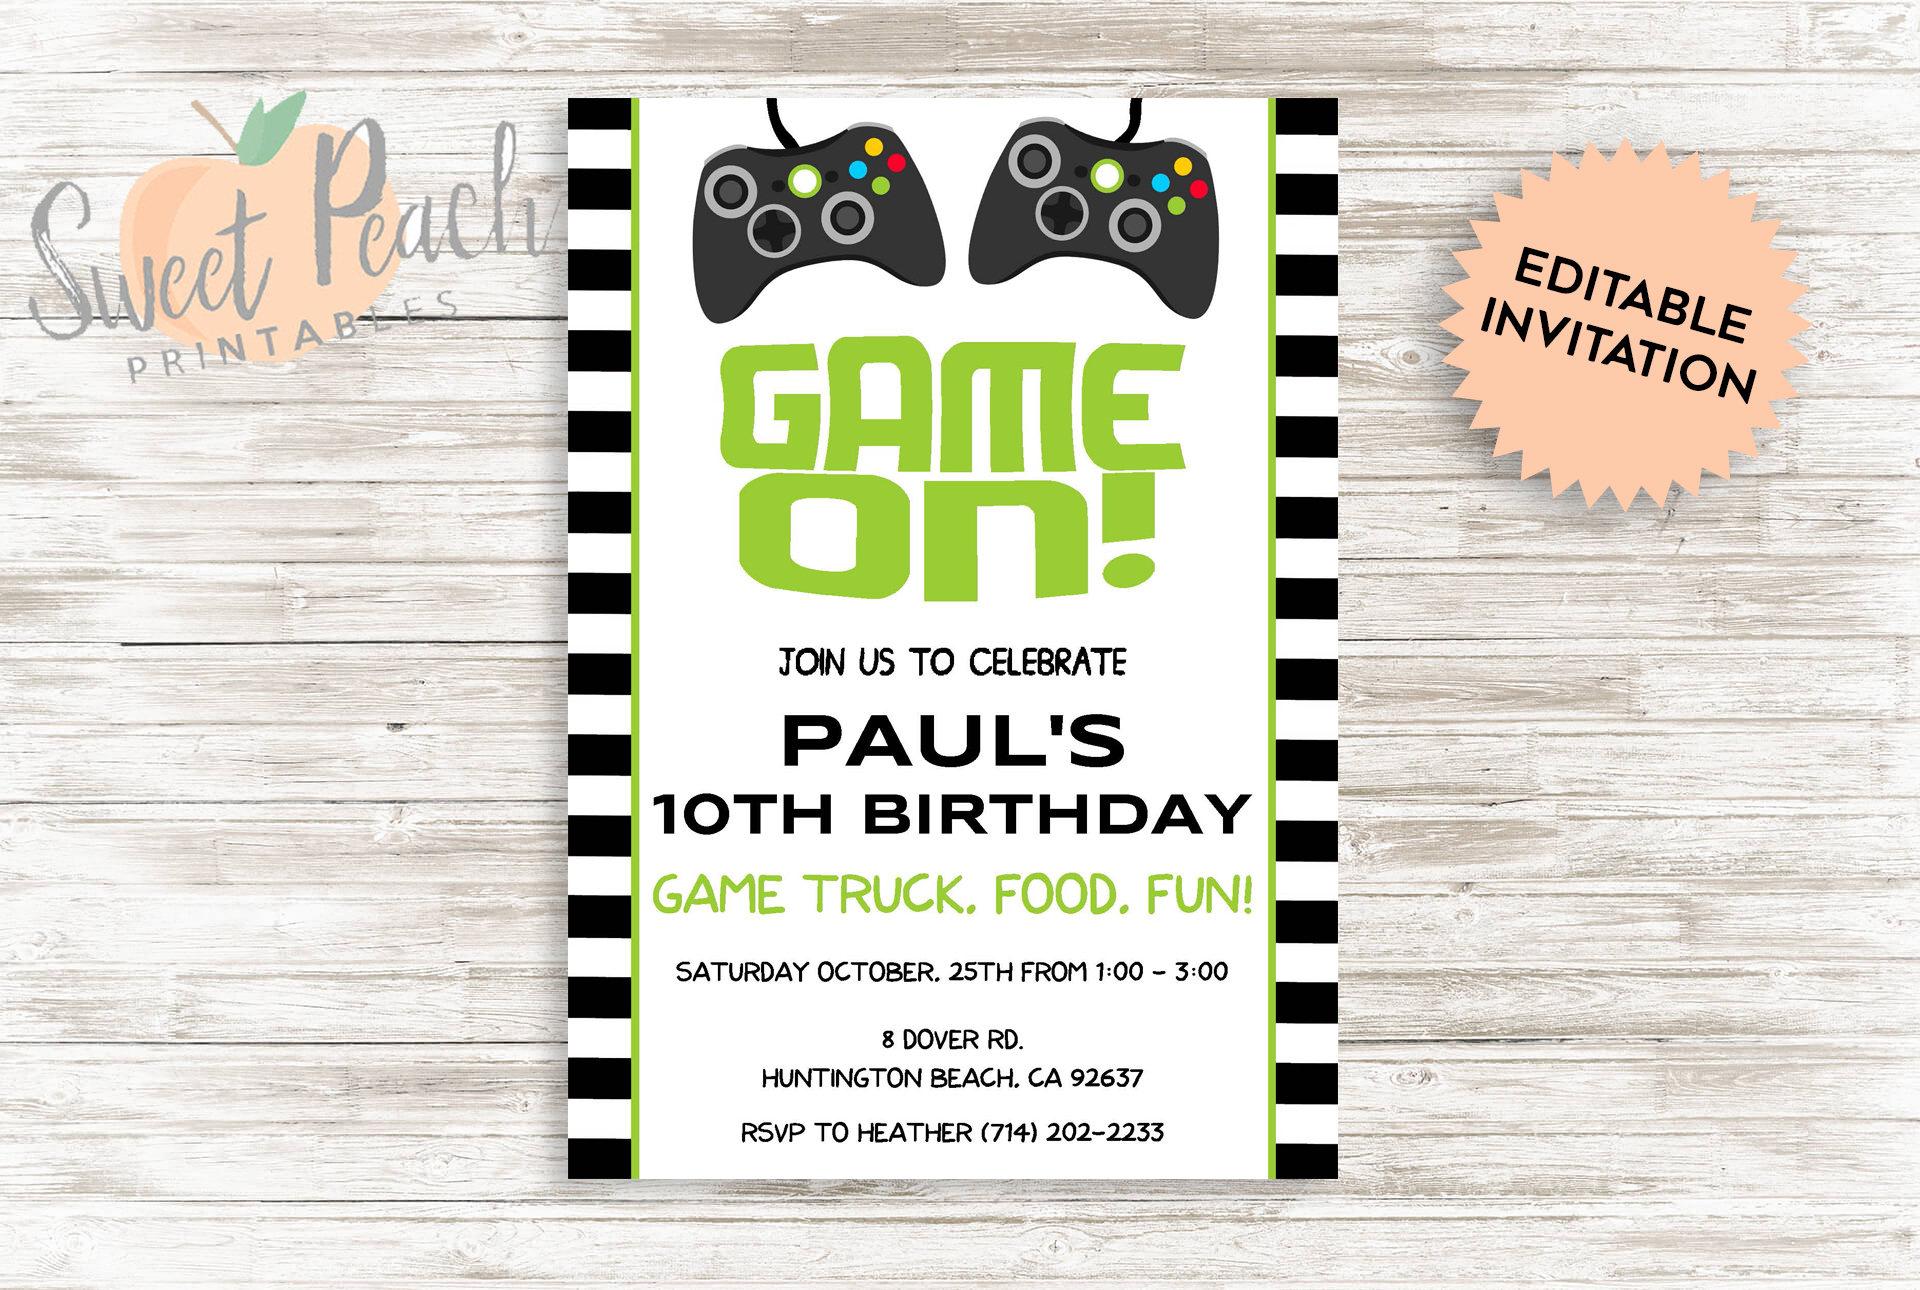 DIY Game Truck Birthday Invite DIY Personalized Birthday